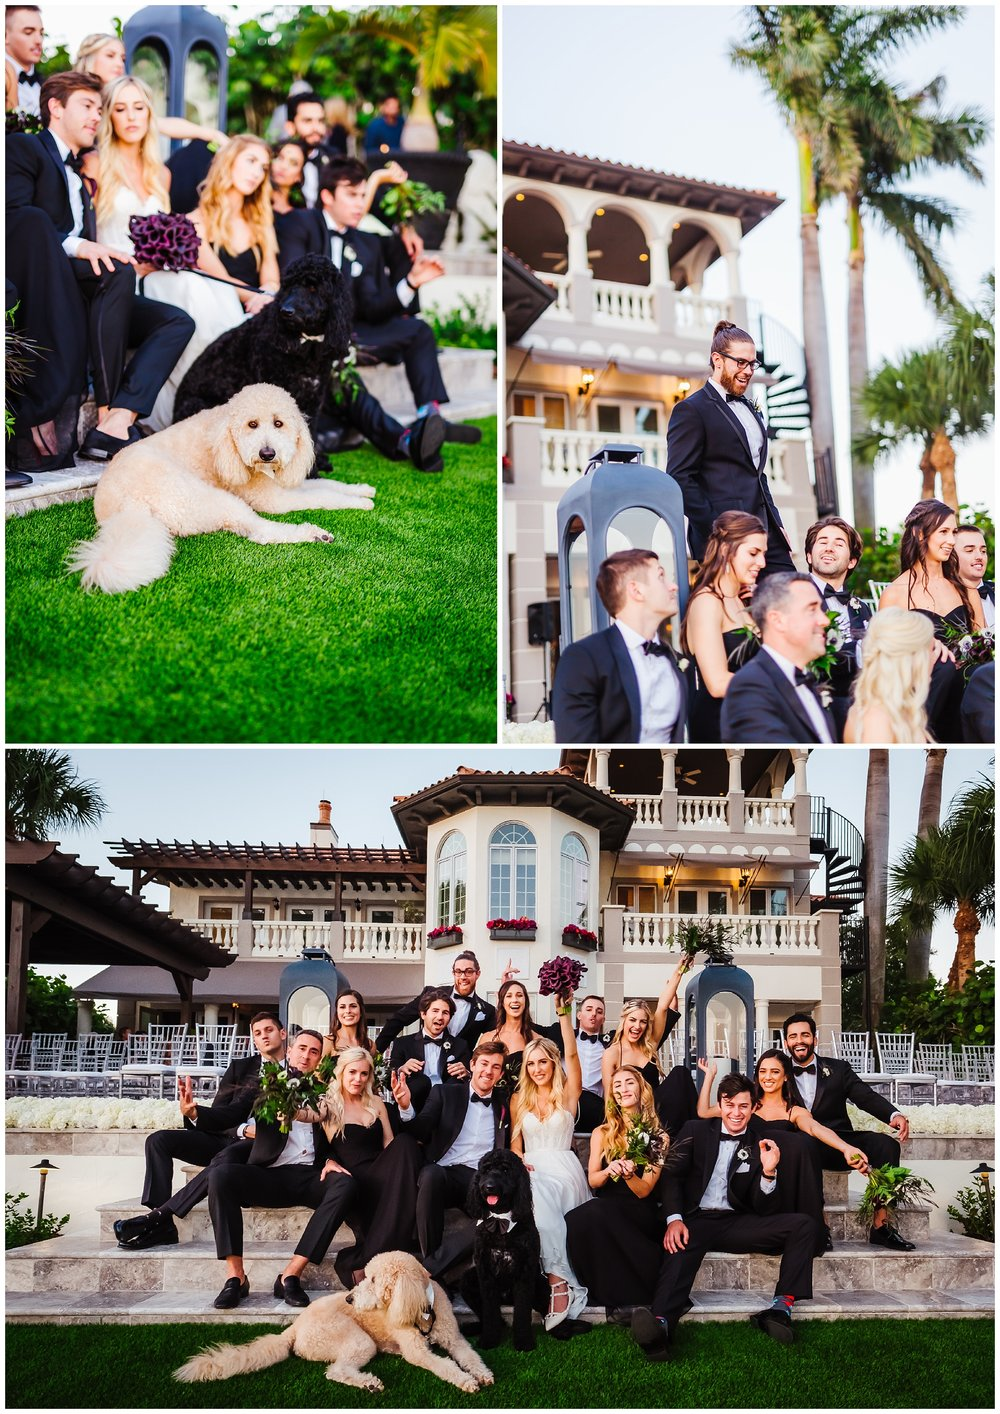 st-pete-wedding-photographer-backyard-luxury-snell-isle-vinoy_0048.jpg